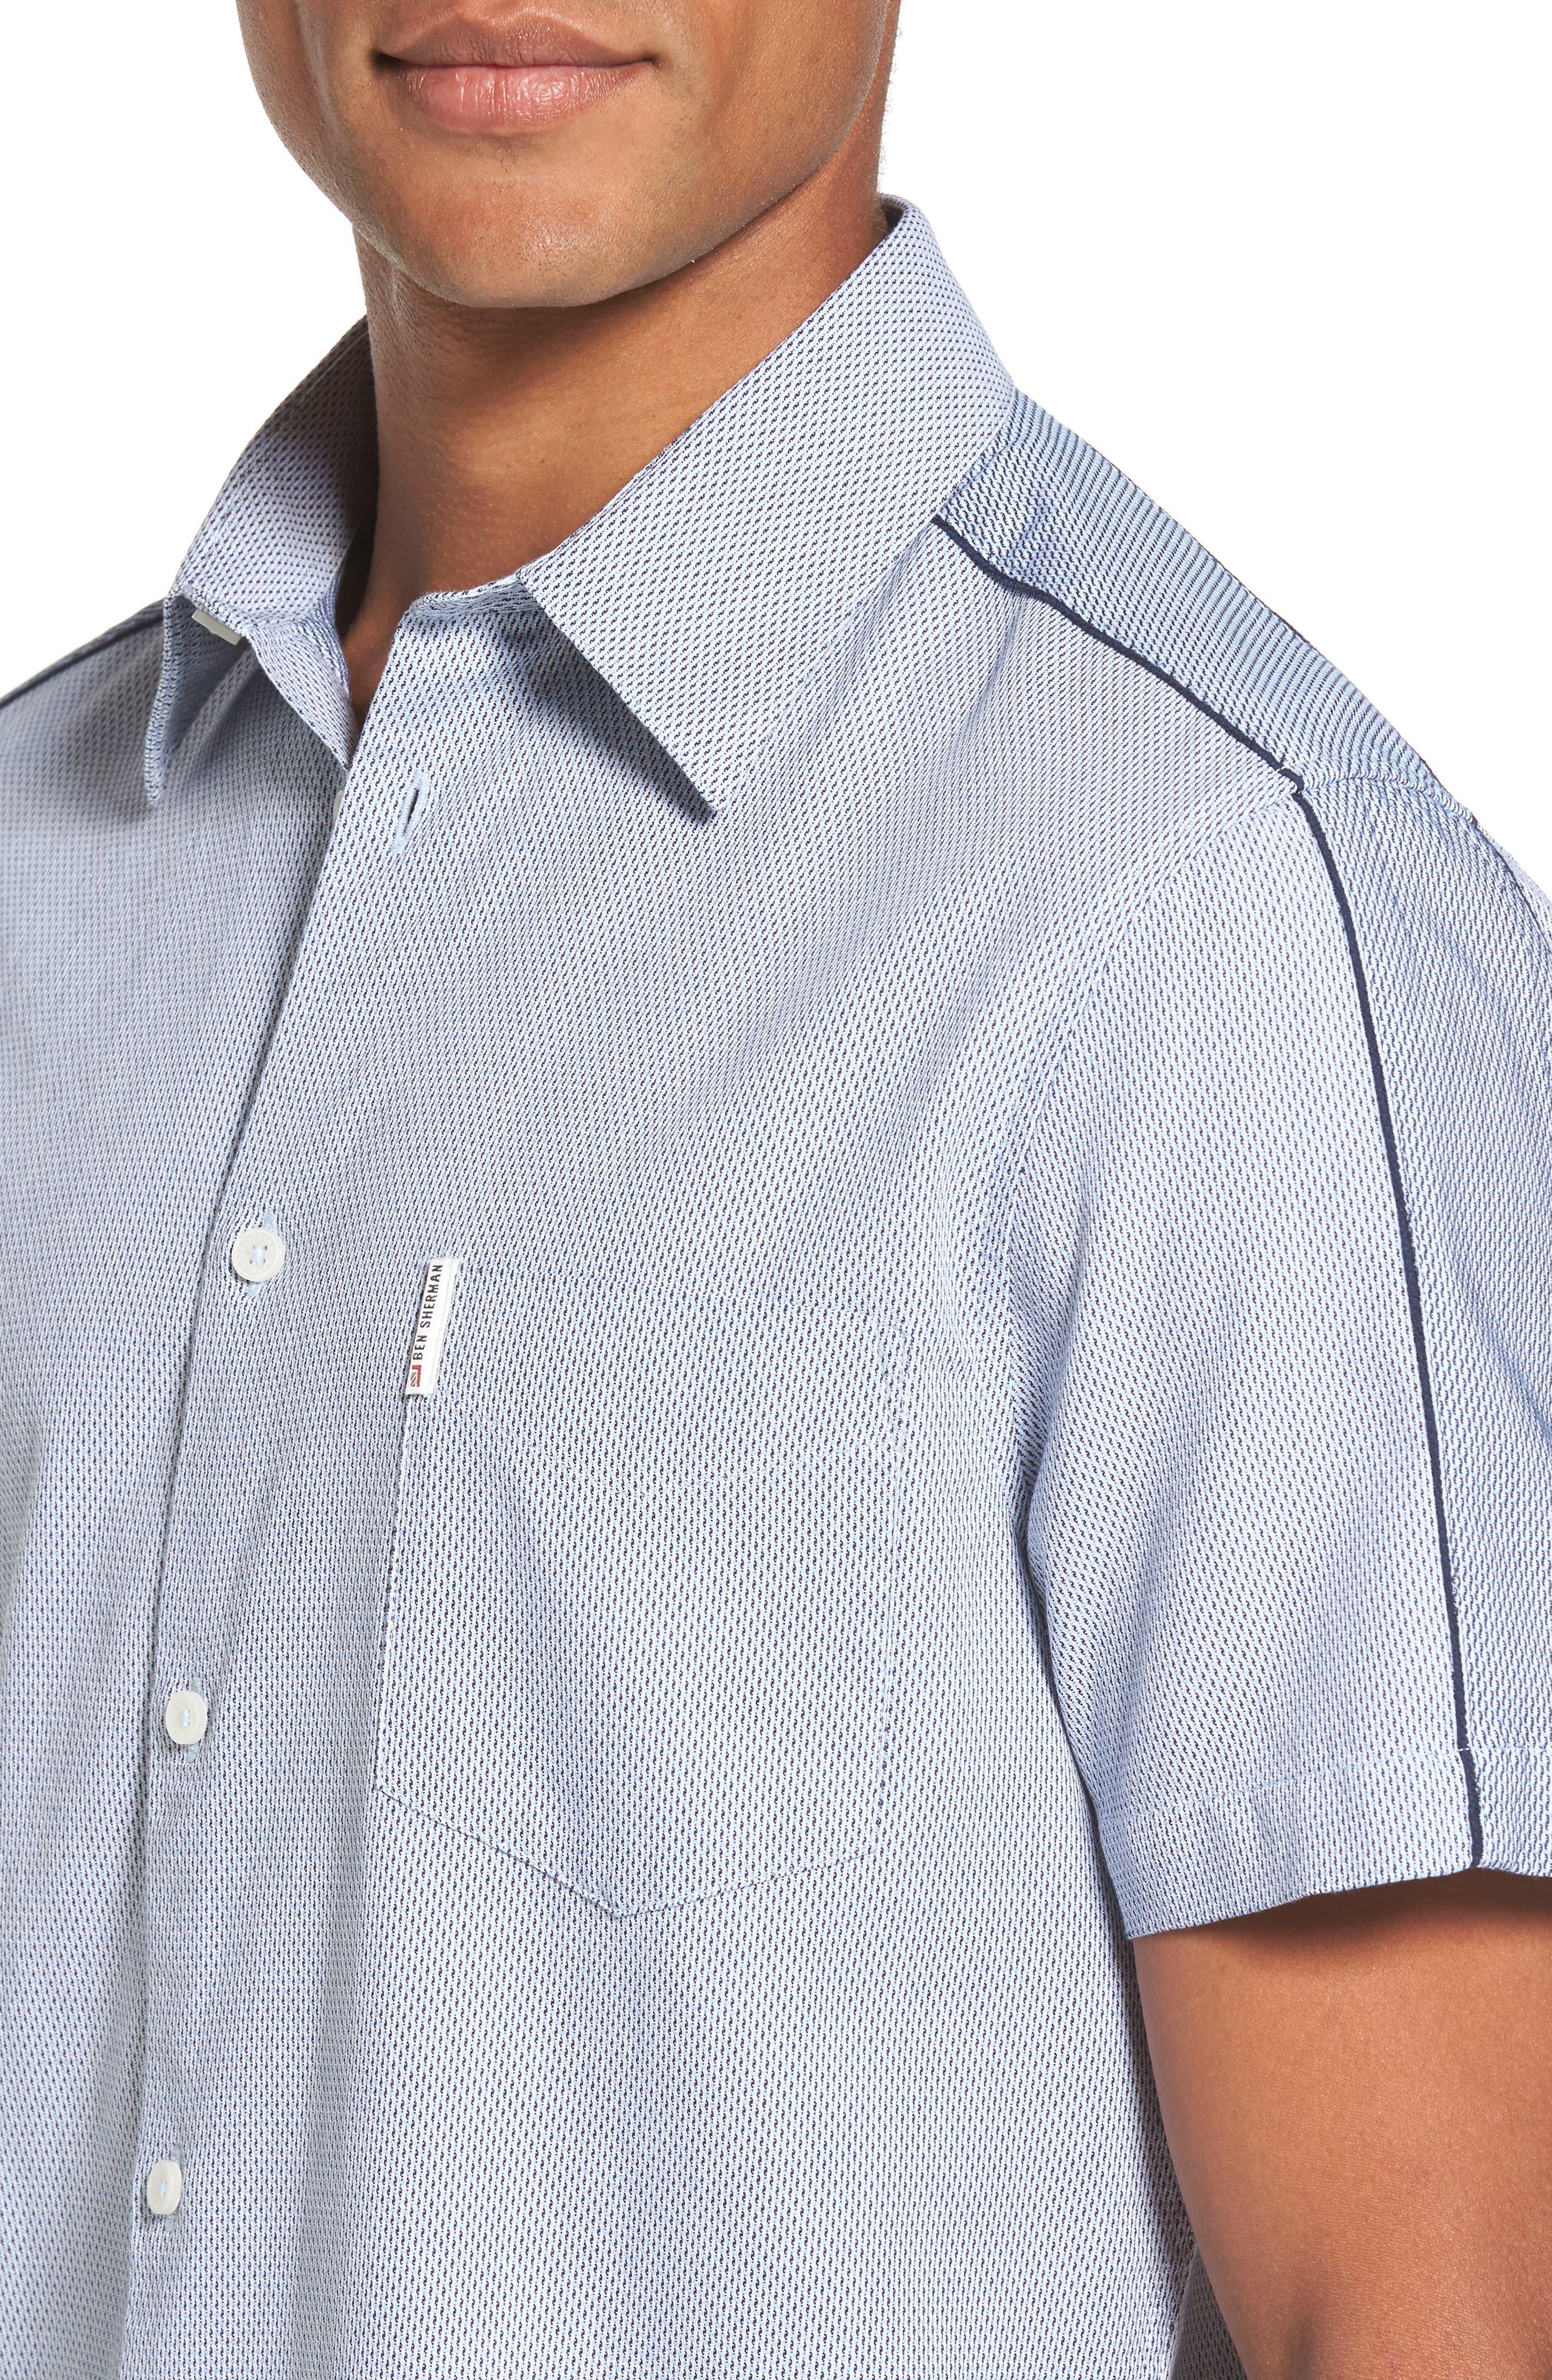 Dobby Short Sleeve Shirt,                             Alternate thumbnail 4, color,                             450